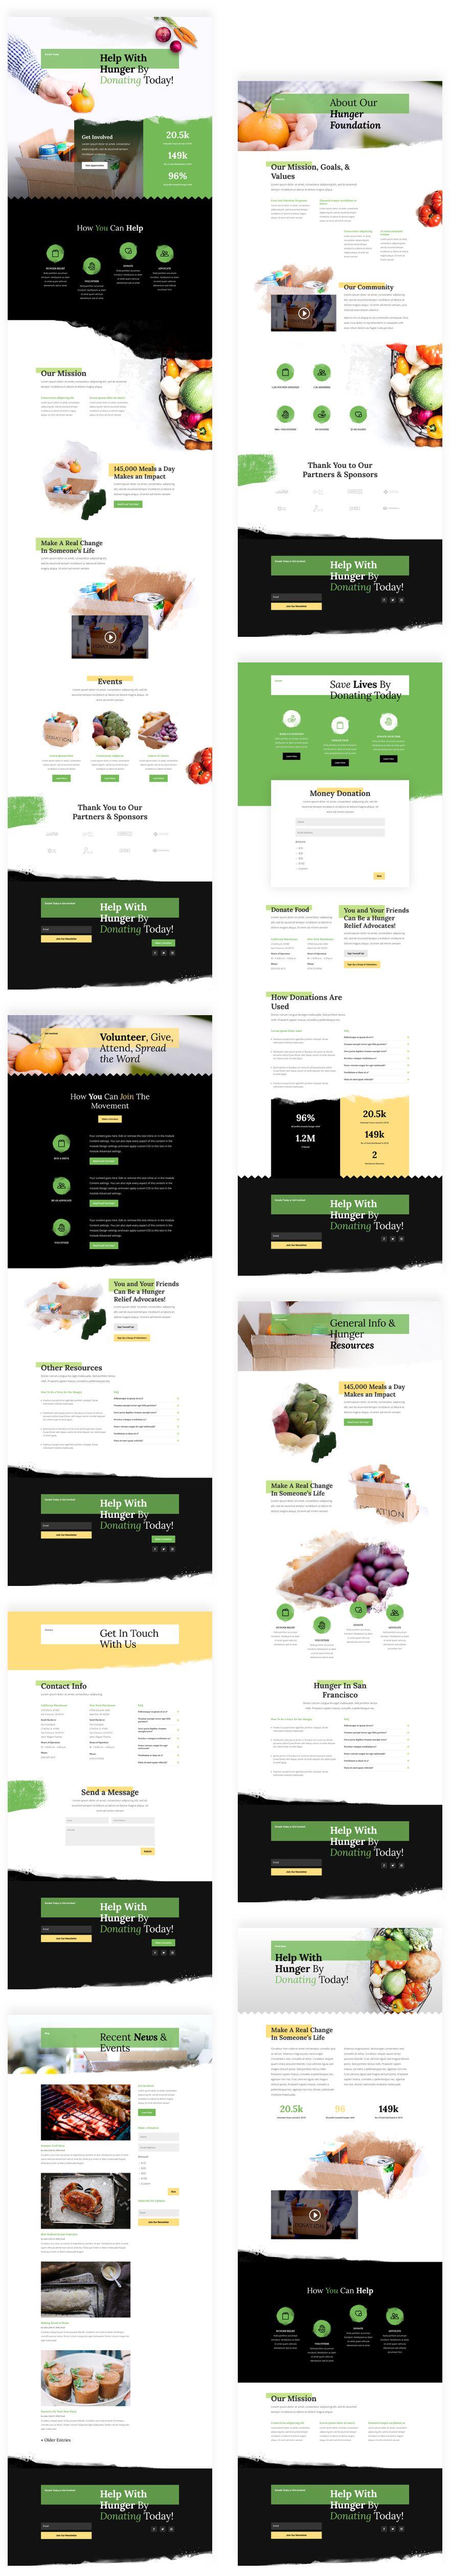 Food Bank Divi Layout Pack